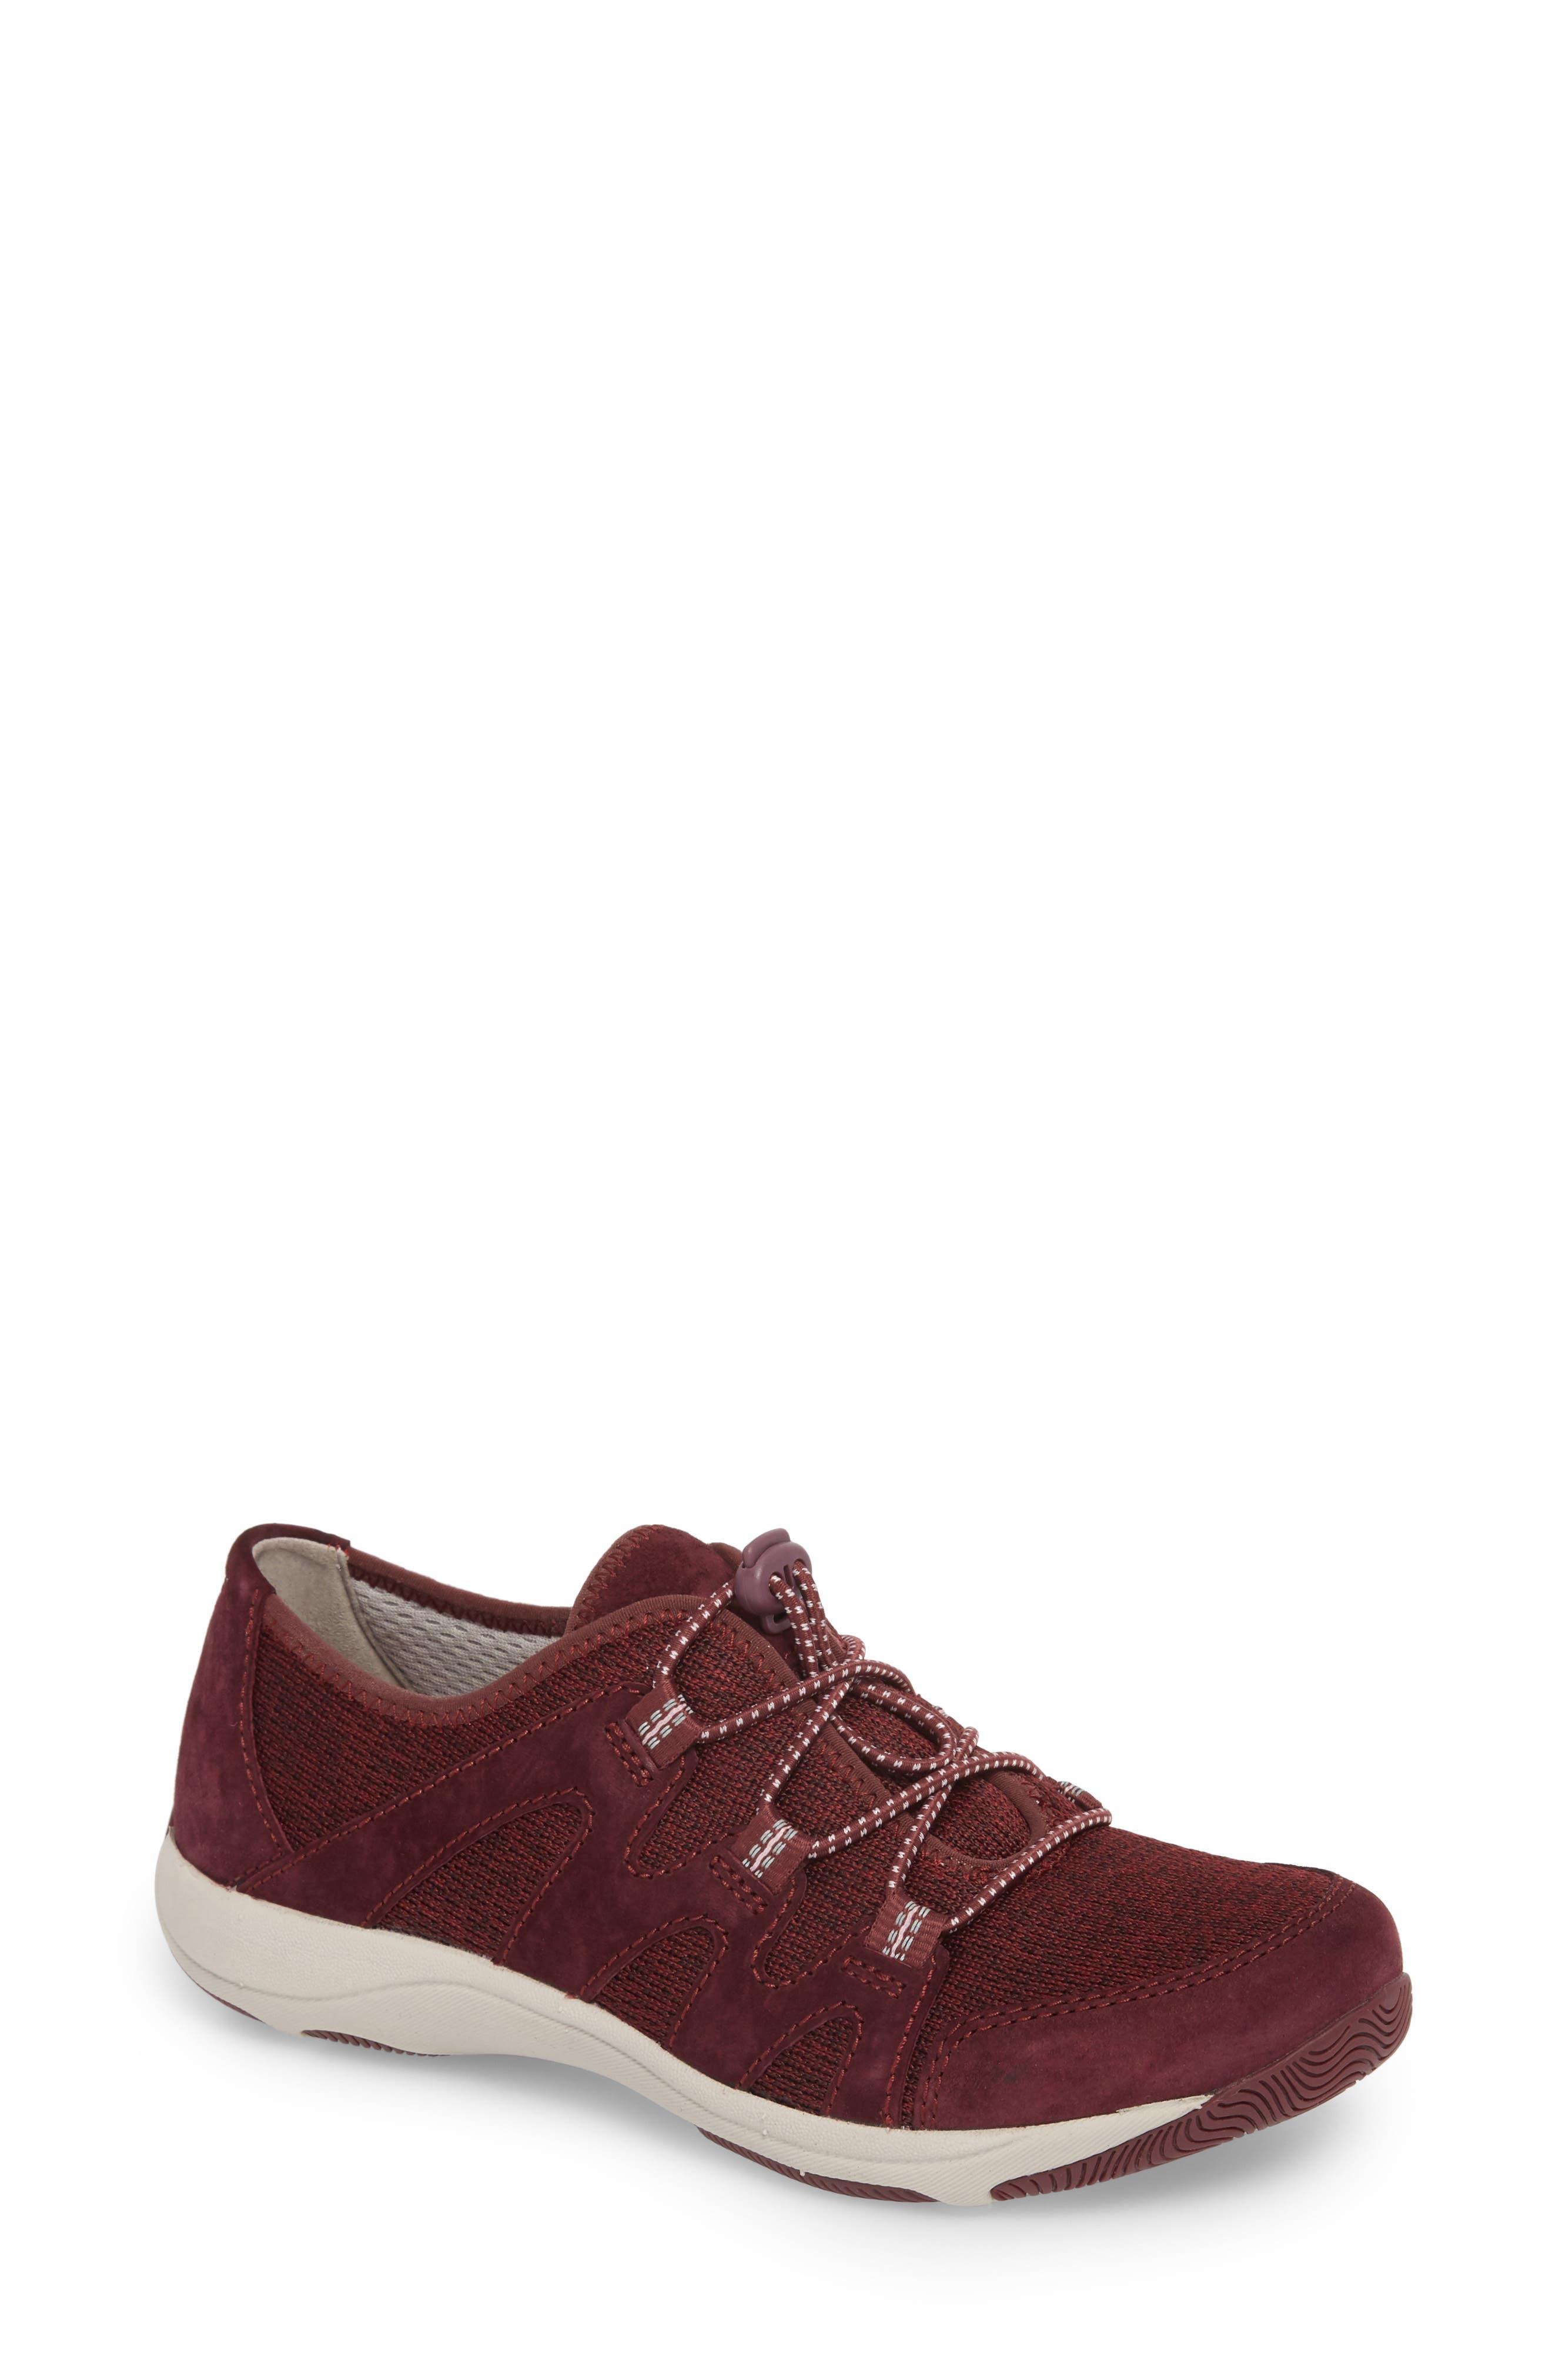 DANSKO, Holland Sneaker, Main thumbnail 1, color, WINE SUEDE